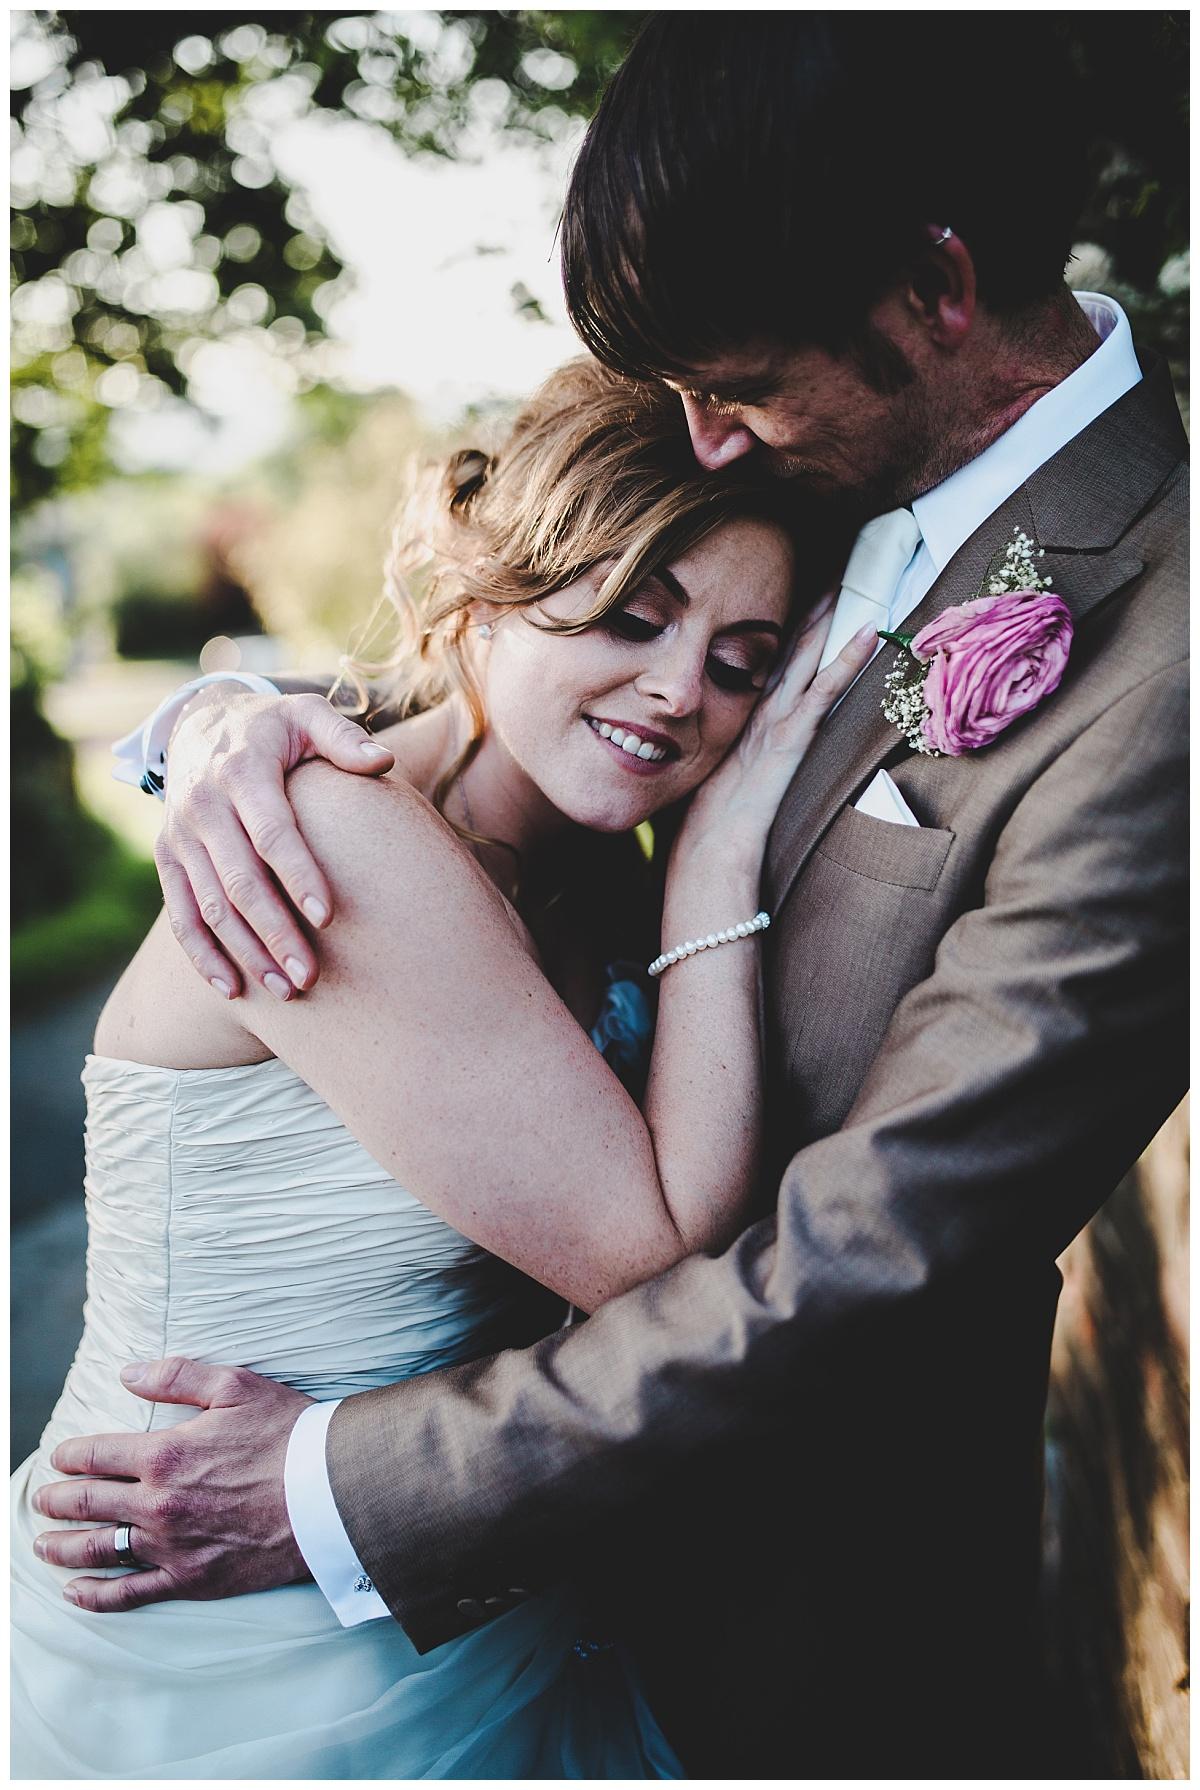 natural wedding photography in lancashire - bride cuddles groom